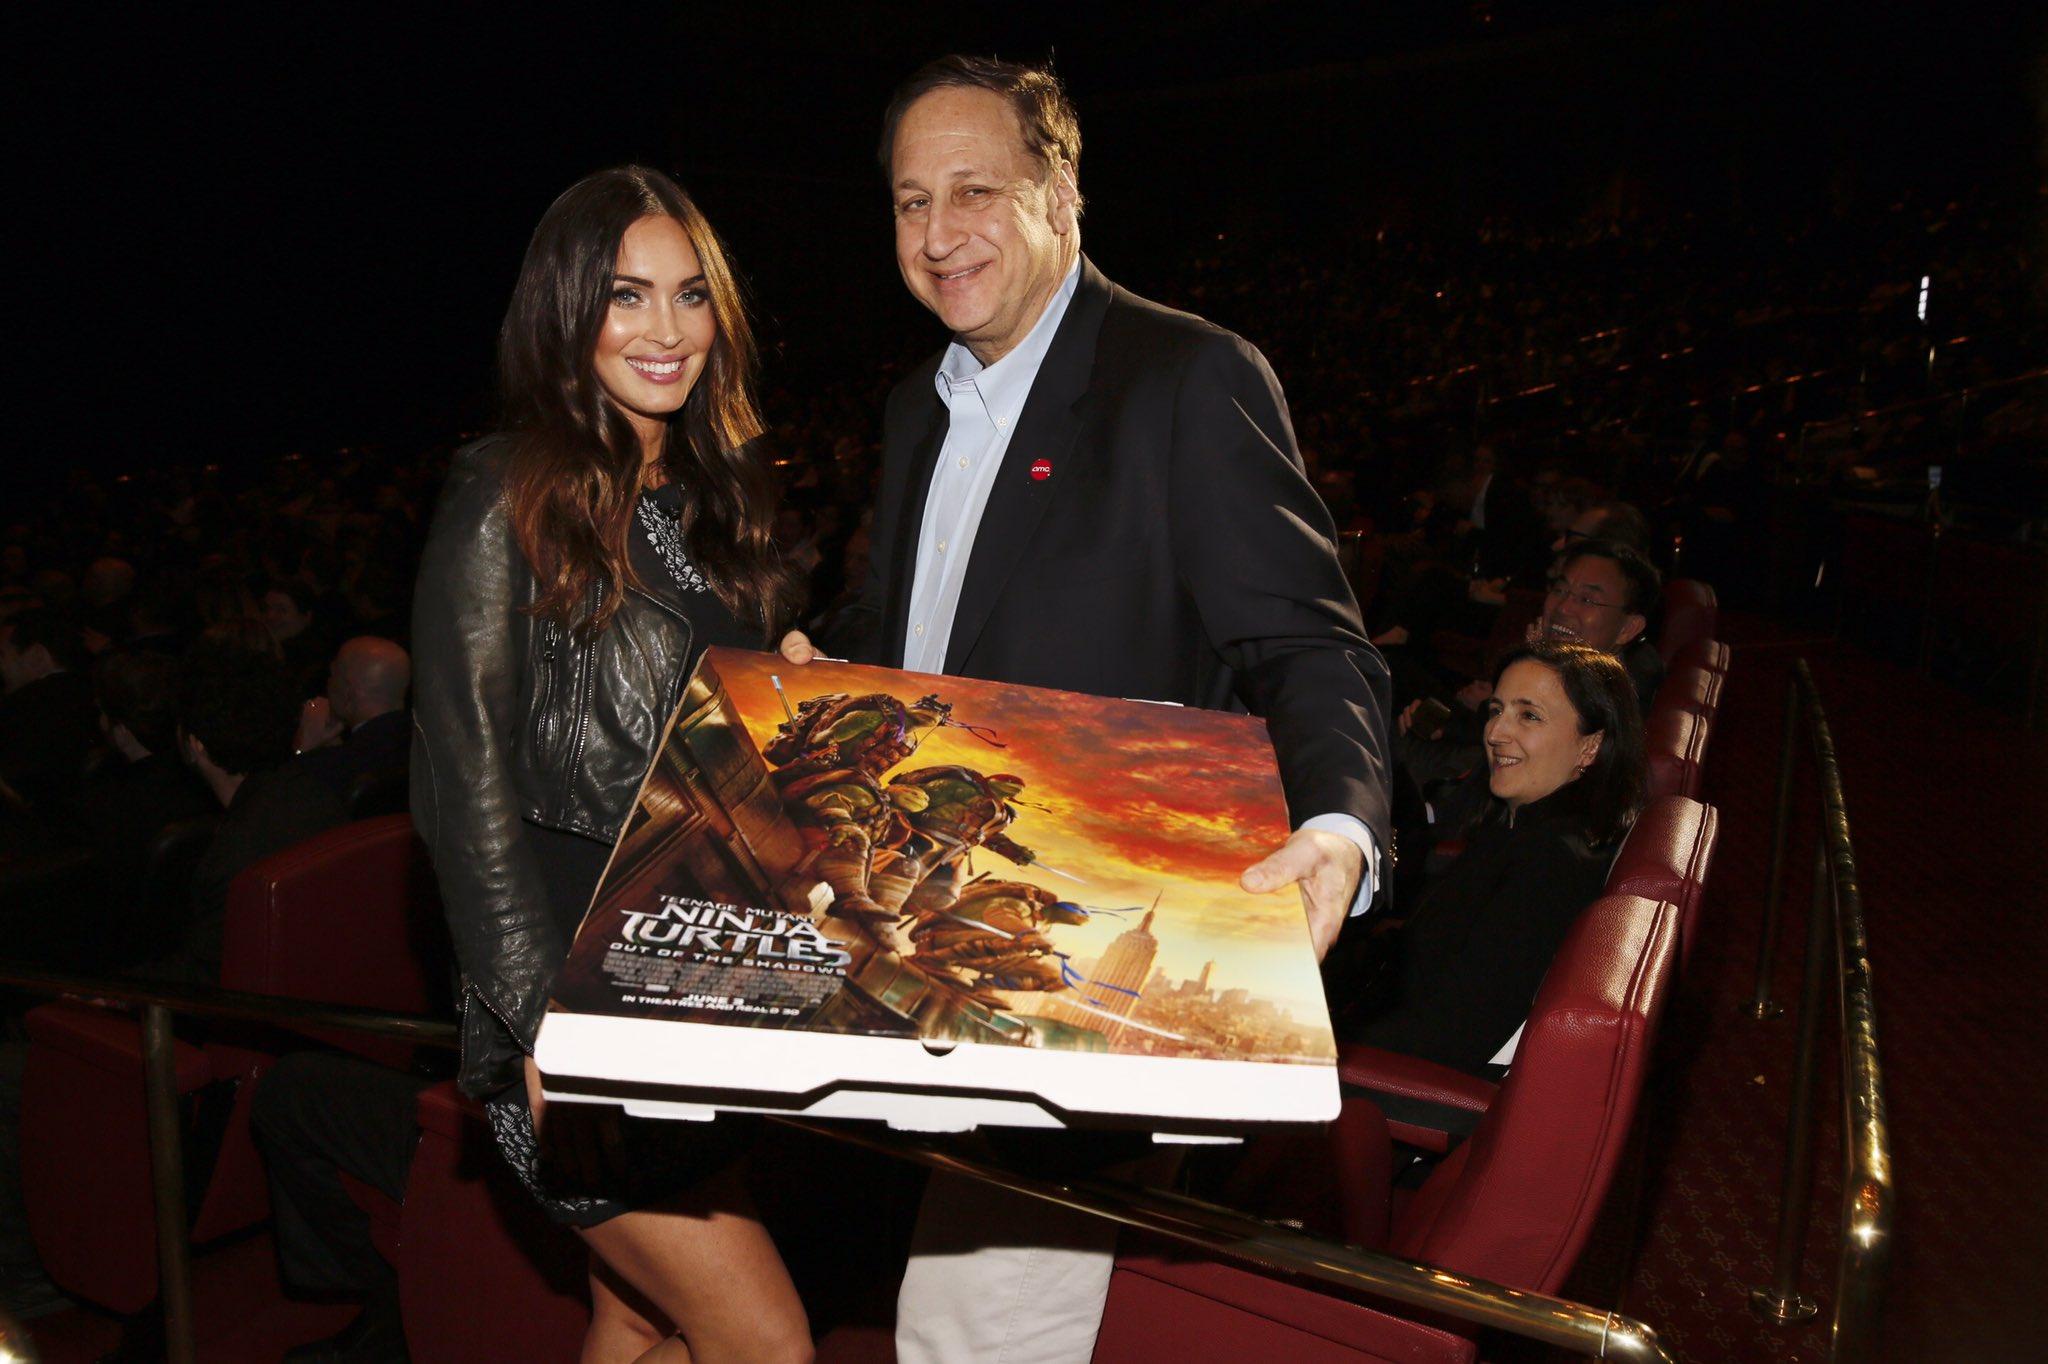 AMC CEO with Megan Fox artist